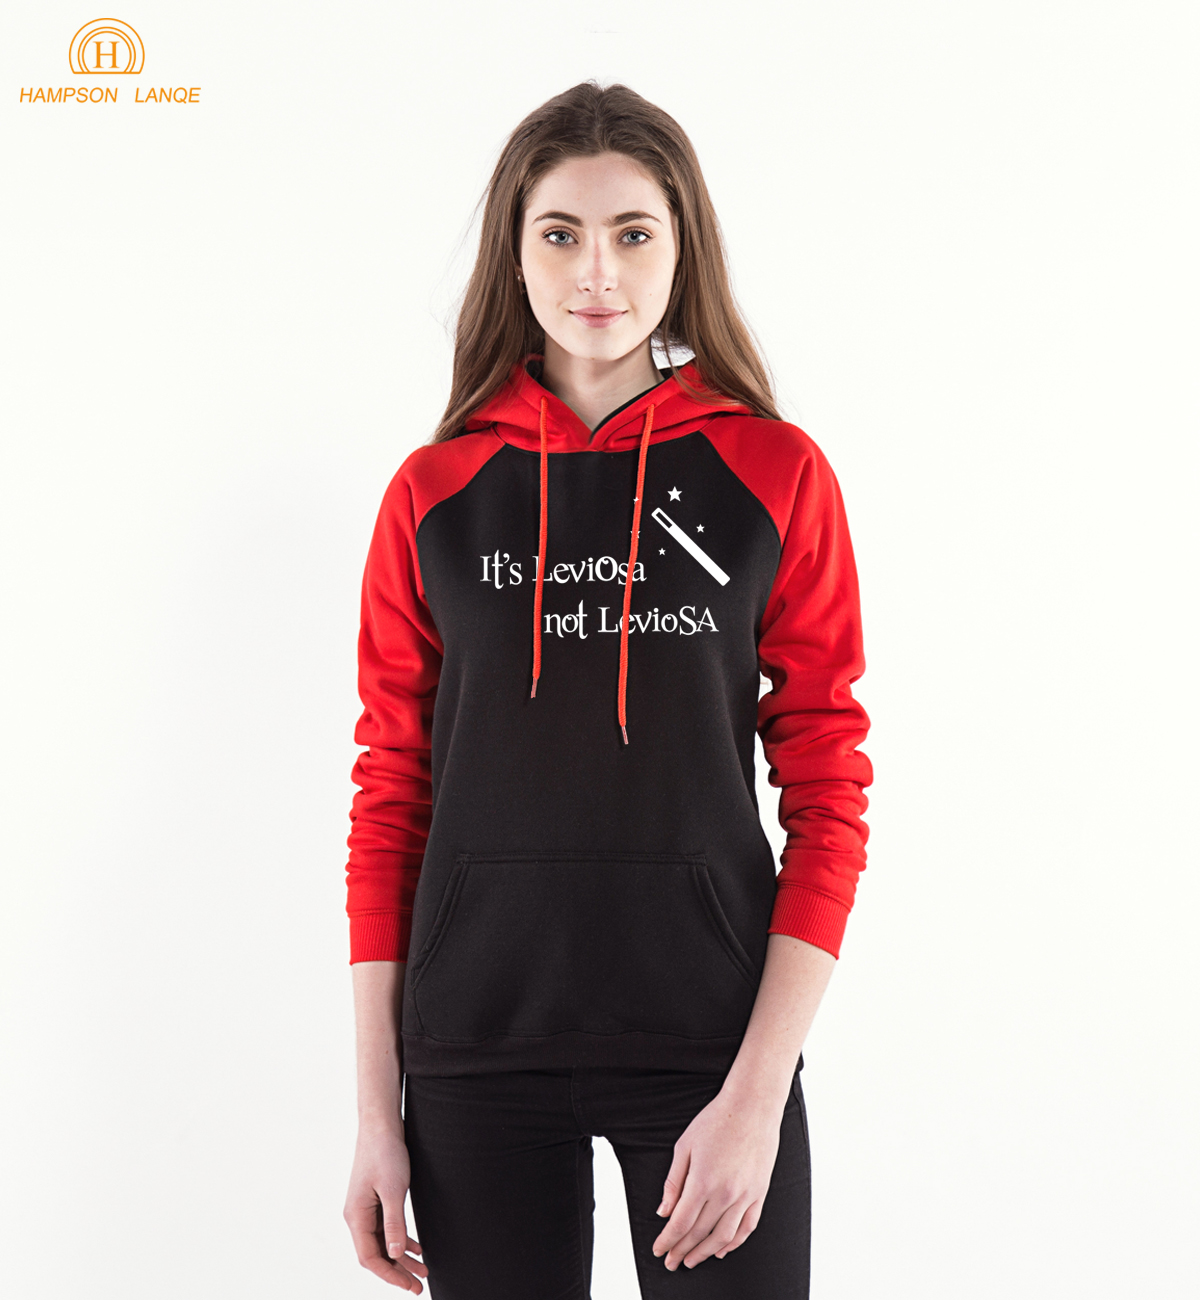 For Adult Hogwarts It's LeviOsa NOT LeviosA Print Women's Sweatshirts 2019 Winter Warm Fleece Hoodies Women Brand Pink Tracksuit